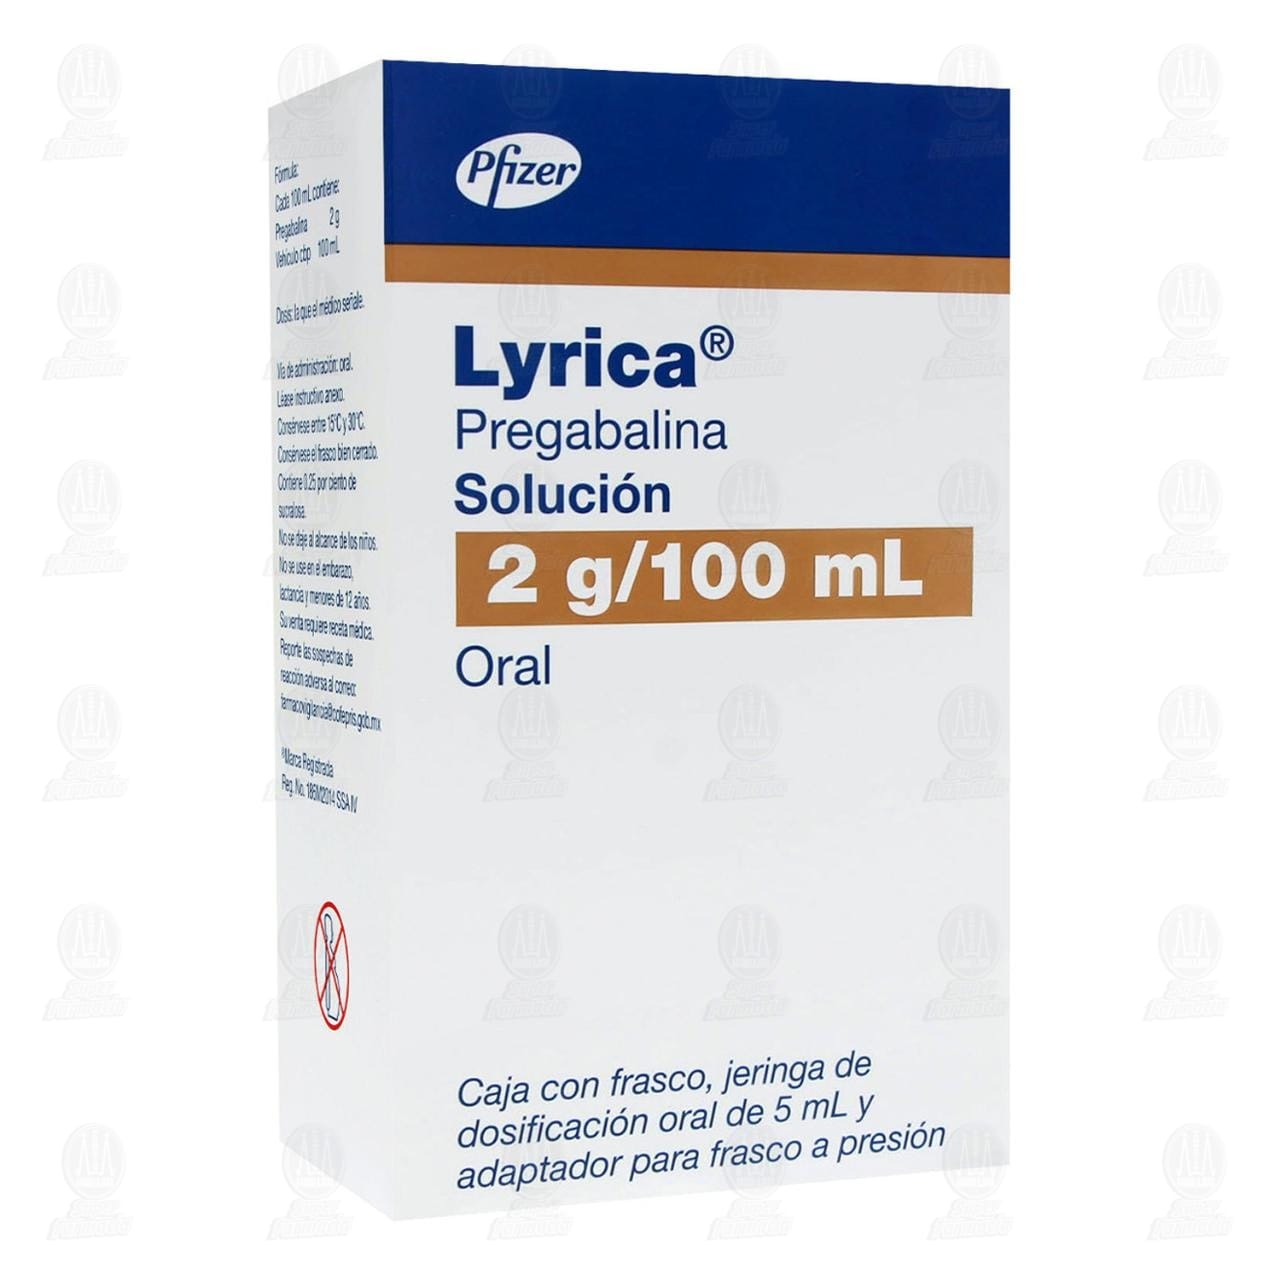 Comprar Lyrica 2gr/100ml Jeringa Dosificadora 5ml en Farmacias Guadalajara